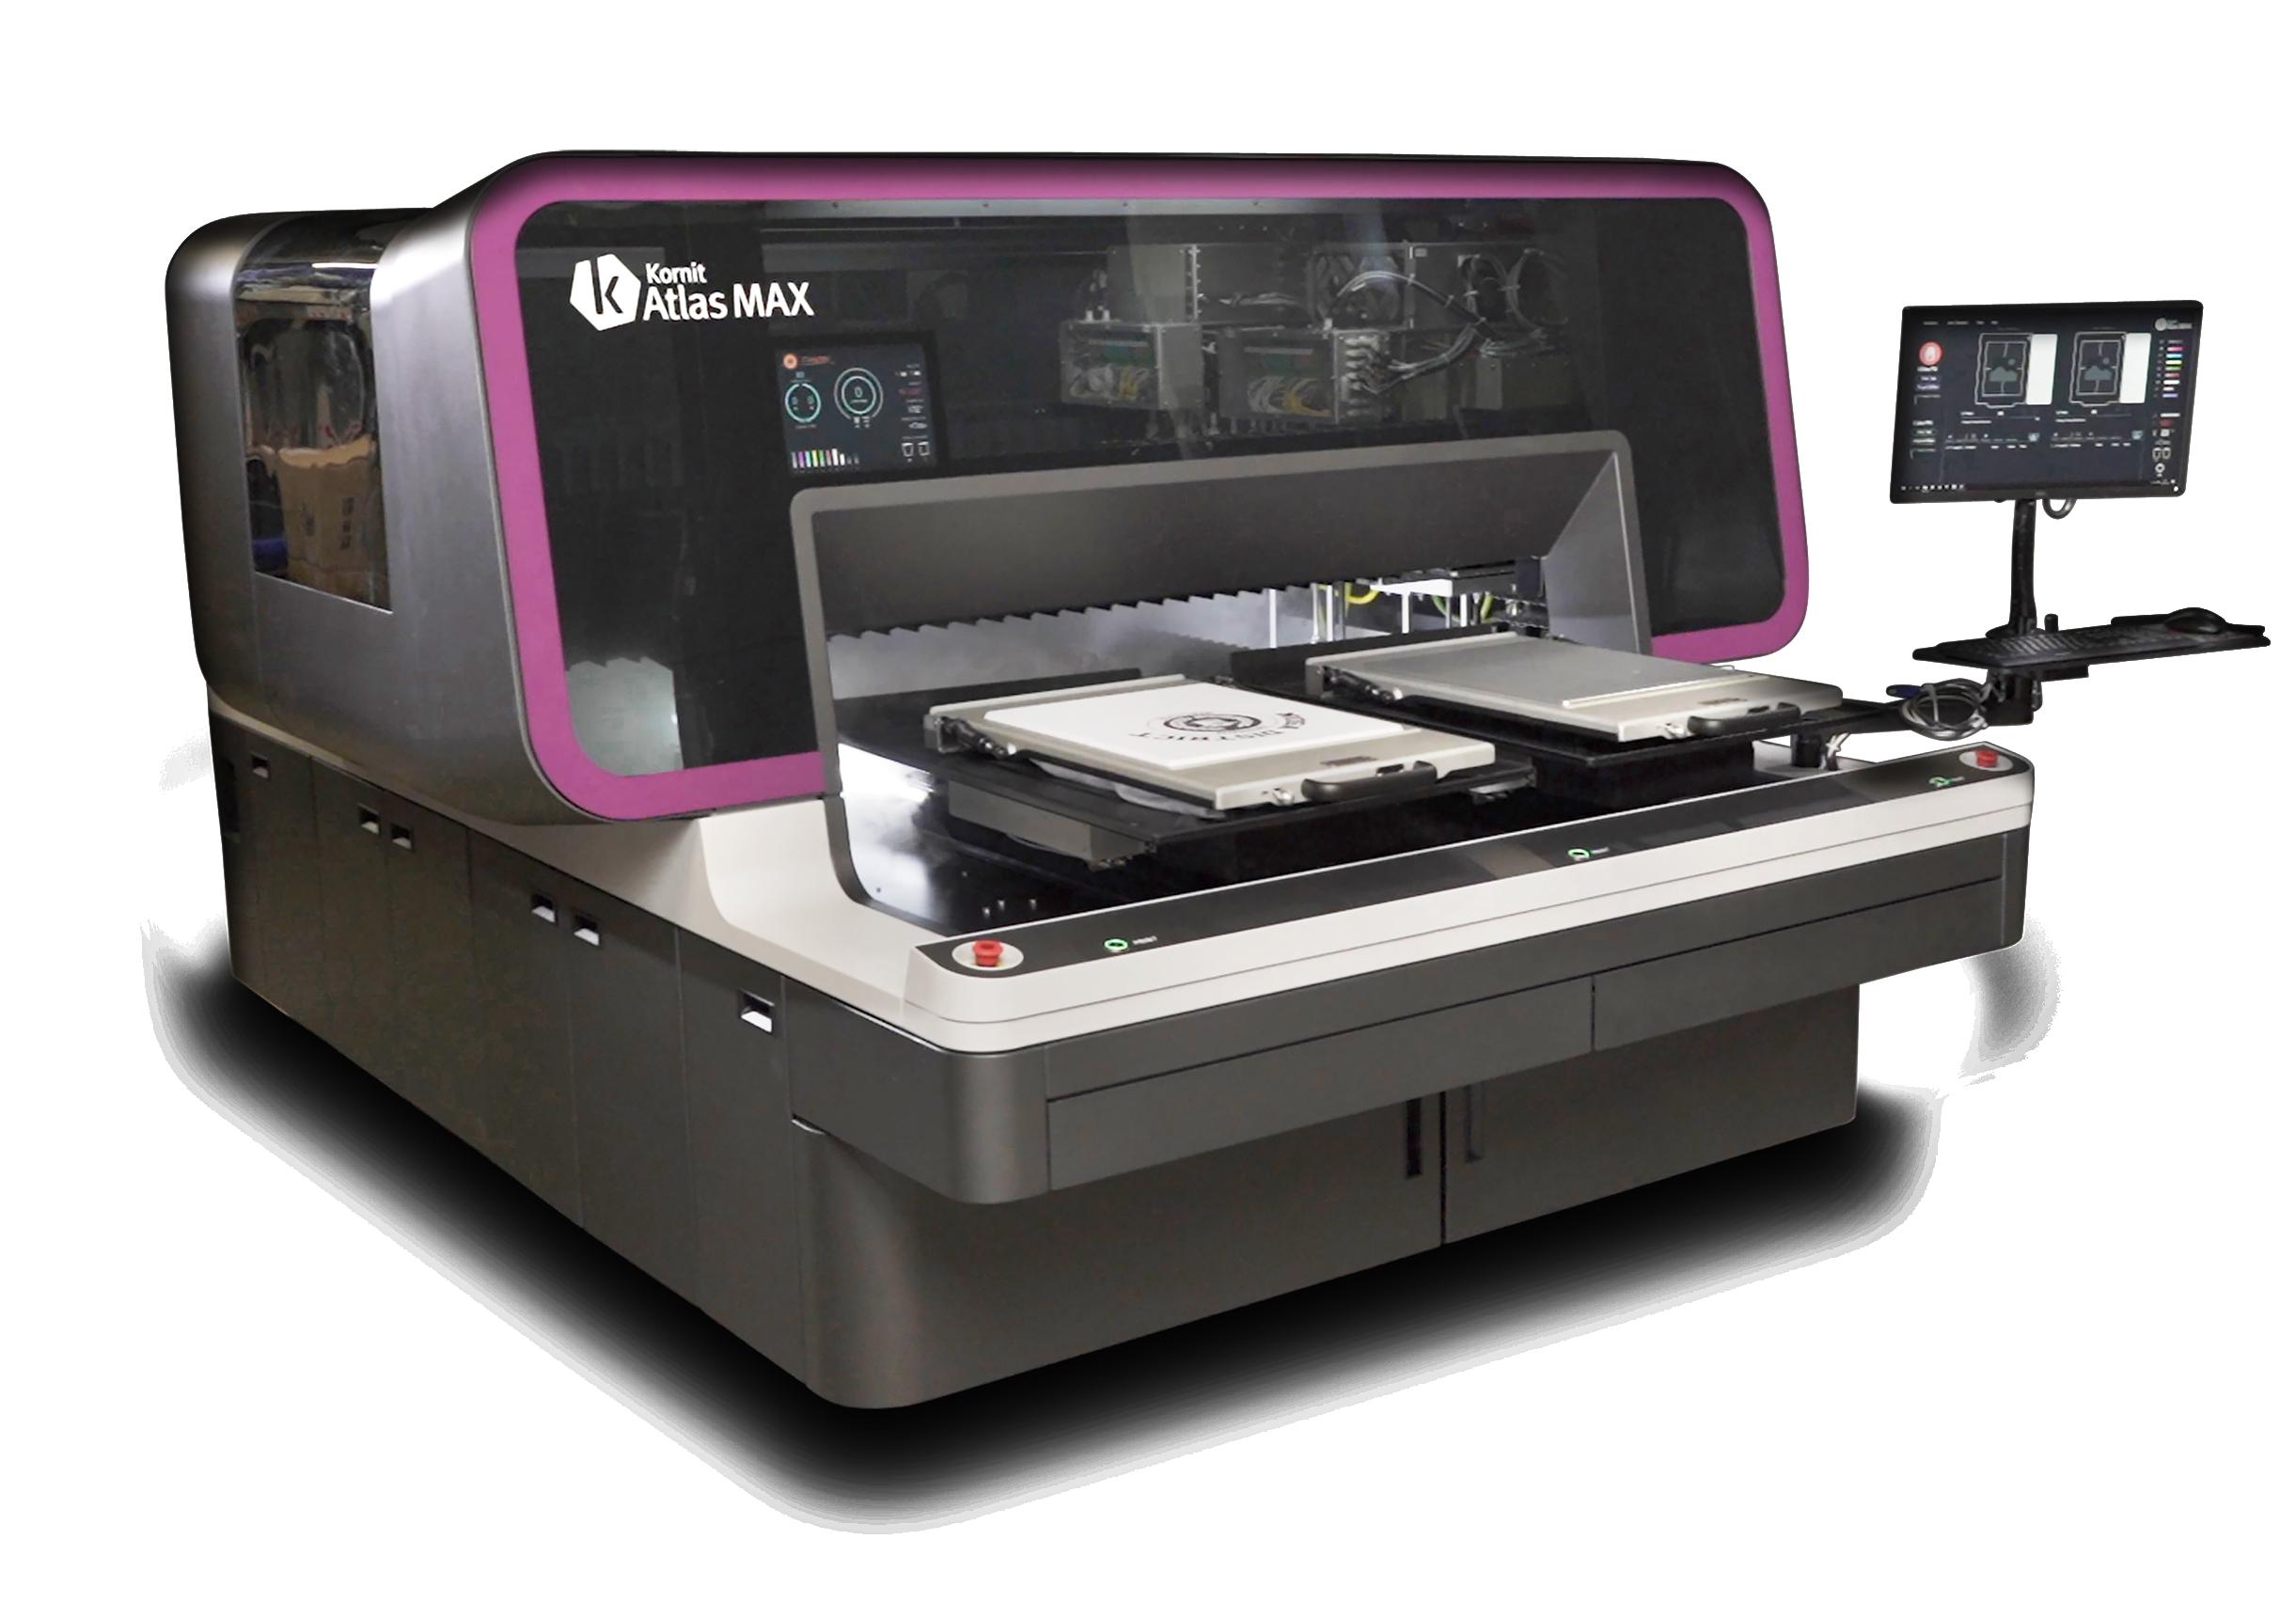 Why Kornit Workshop Atlas Max Direct-to-Garment Printer